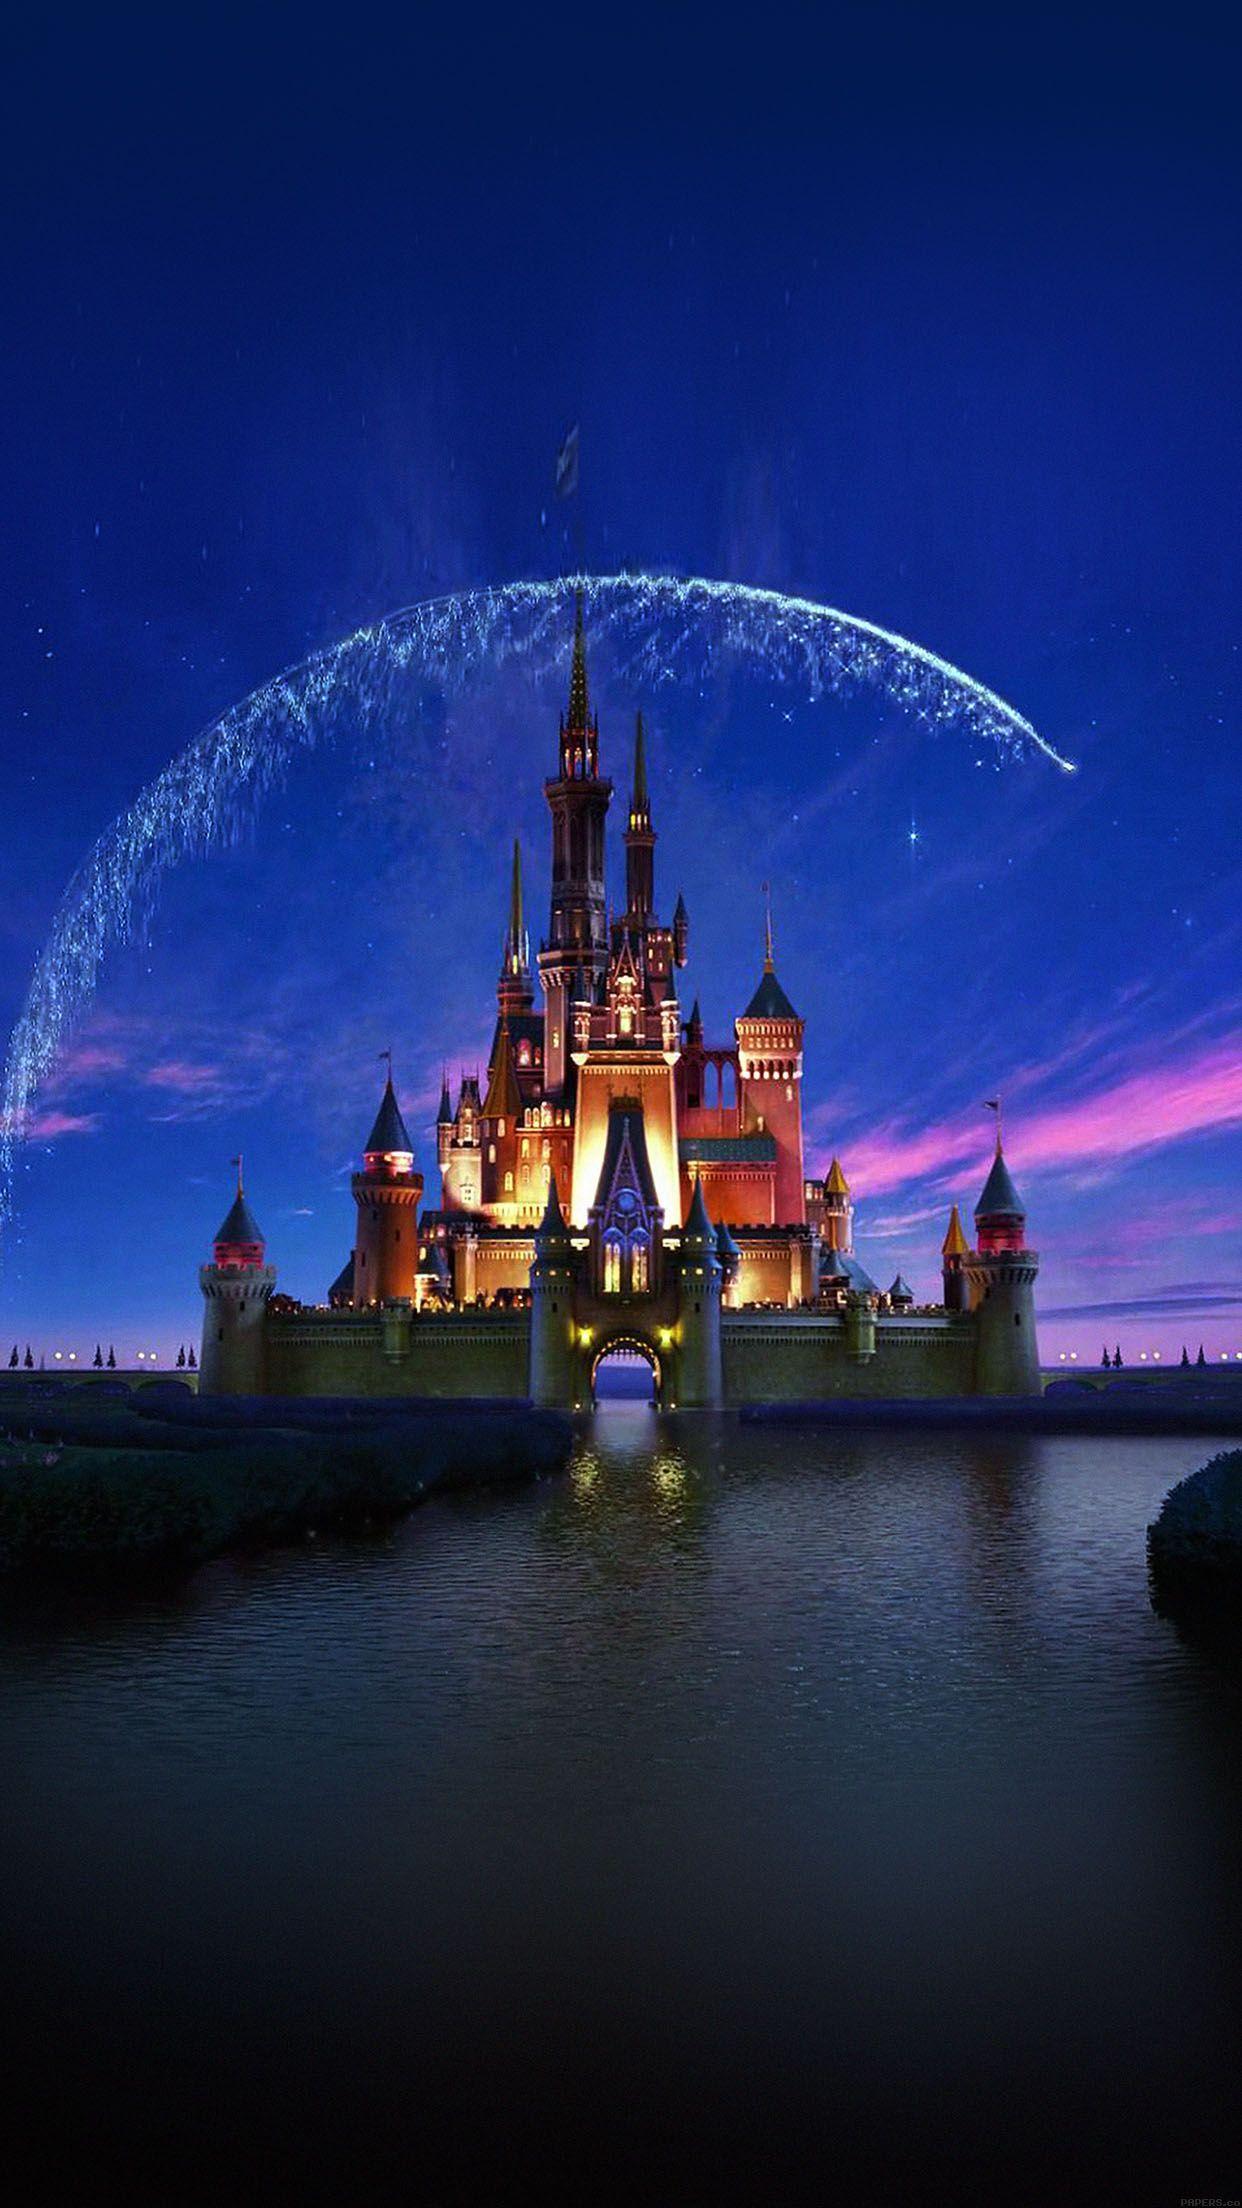 Iphone Xs Max Disney Wallpaper : iphone, disney, wallpaper, IPhone, Disney, Wallpapers, Backgrounds, WallpaperAccess